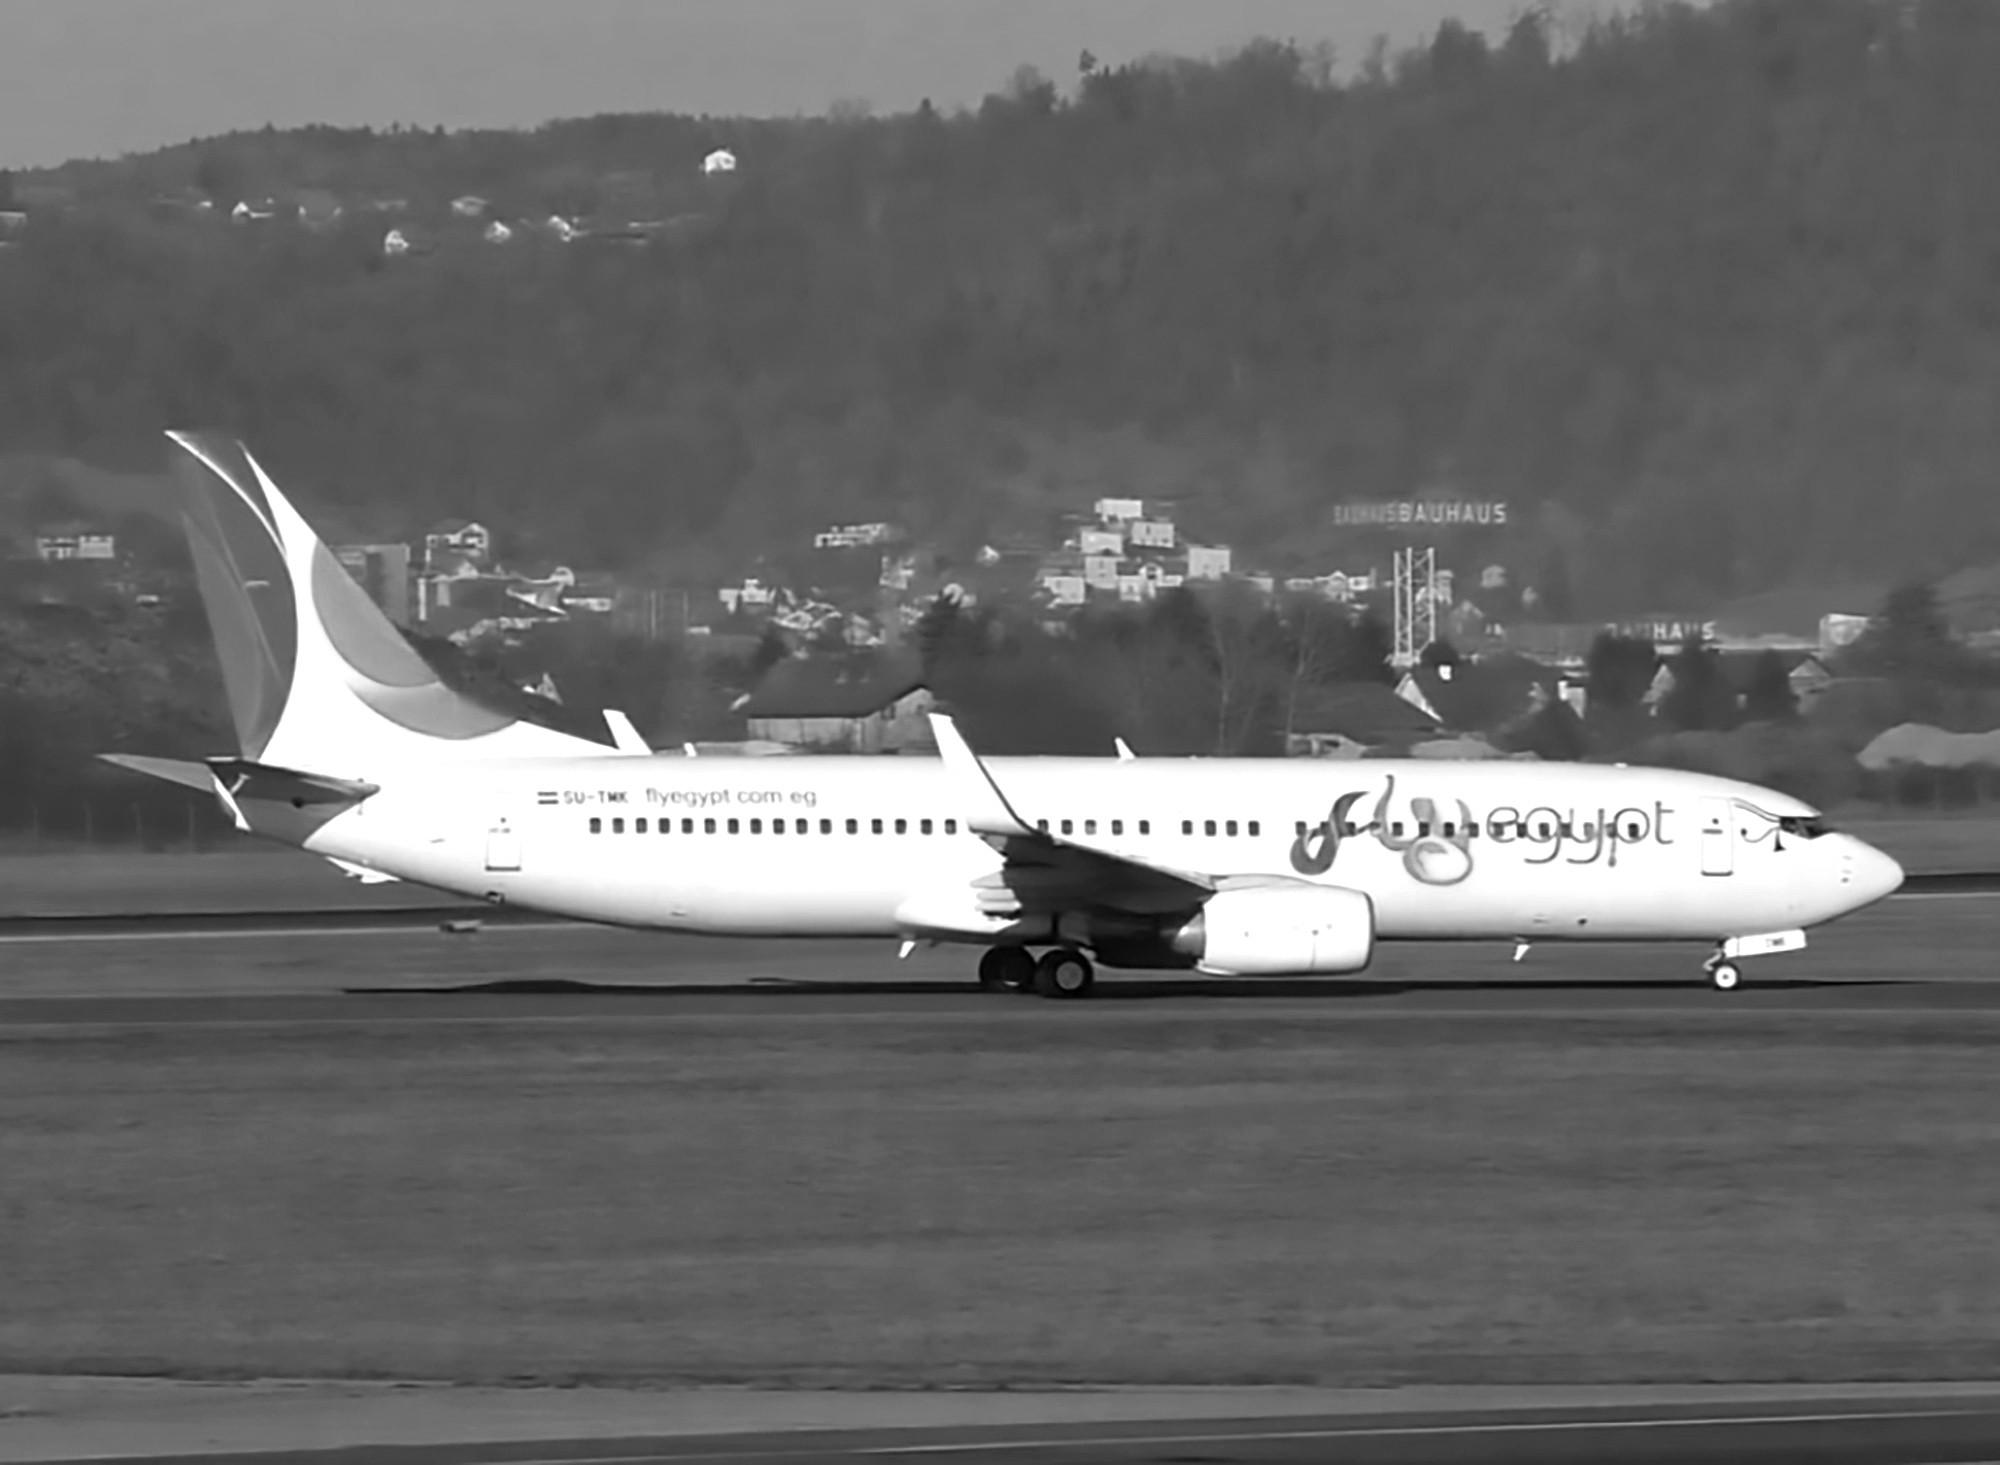 Emergency Boeing 737 Landing After Tail Hits Runway